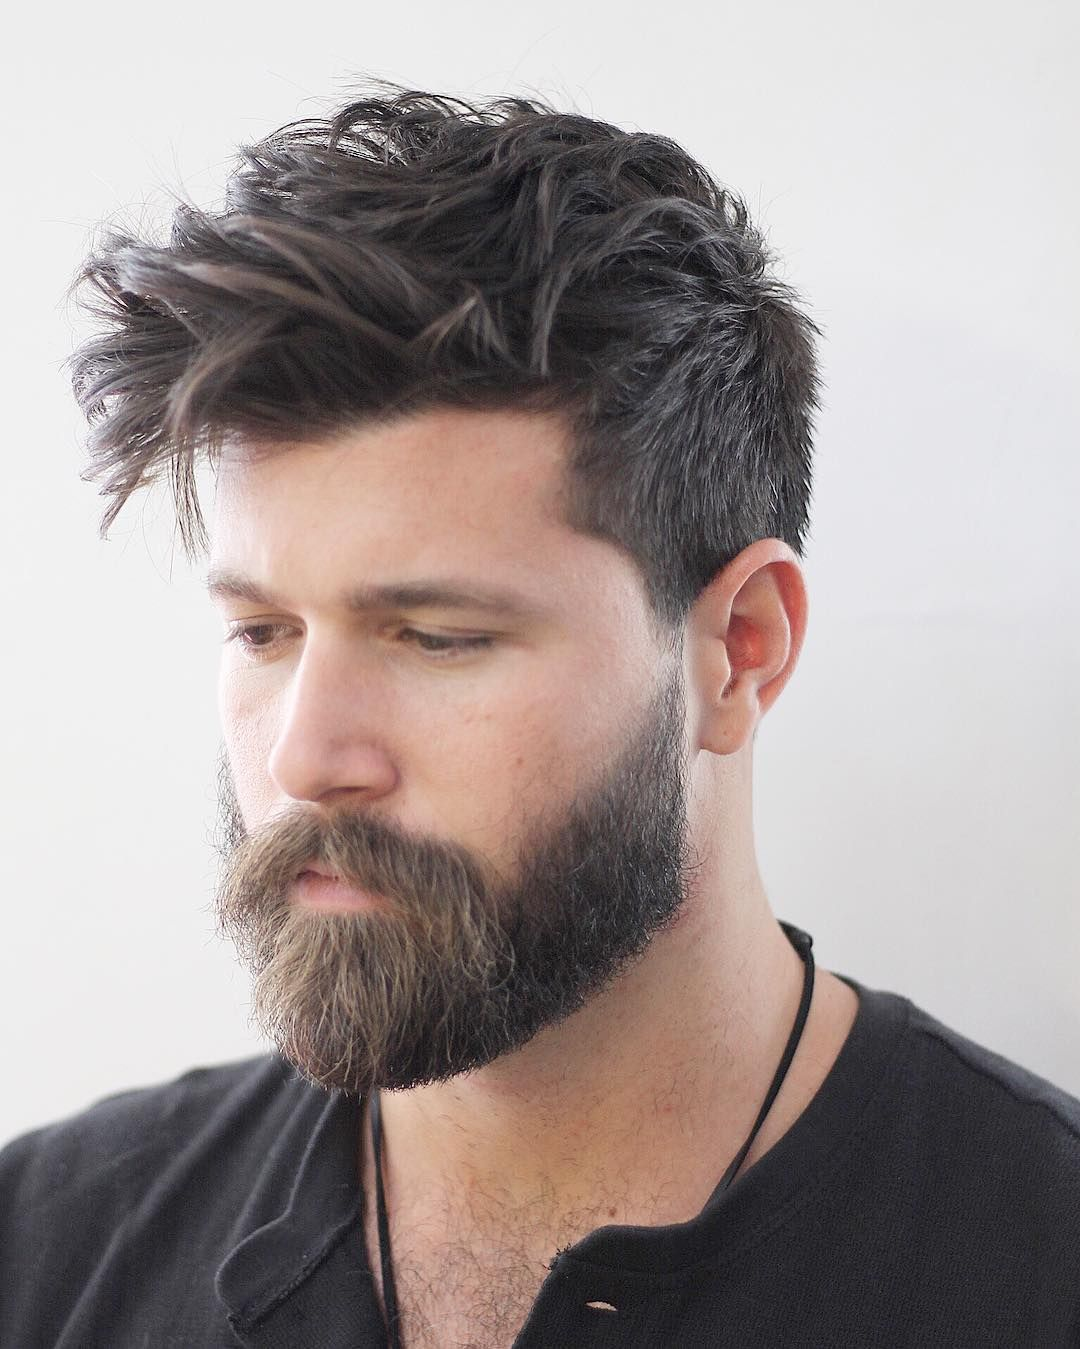 Thick Hairstyles For Men Ну Тутто Хоть Немного Подойдет Мне Top Haircuts For Men